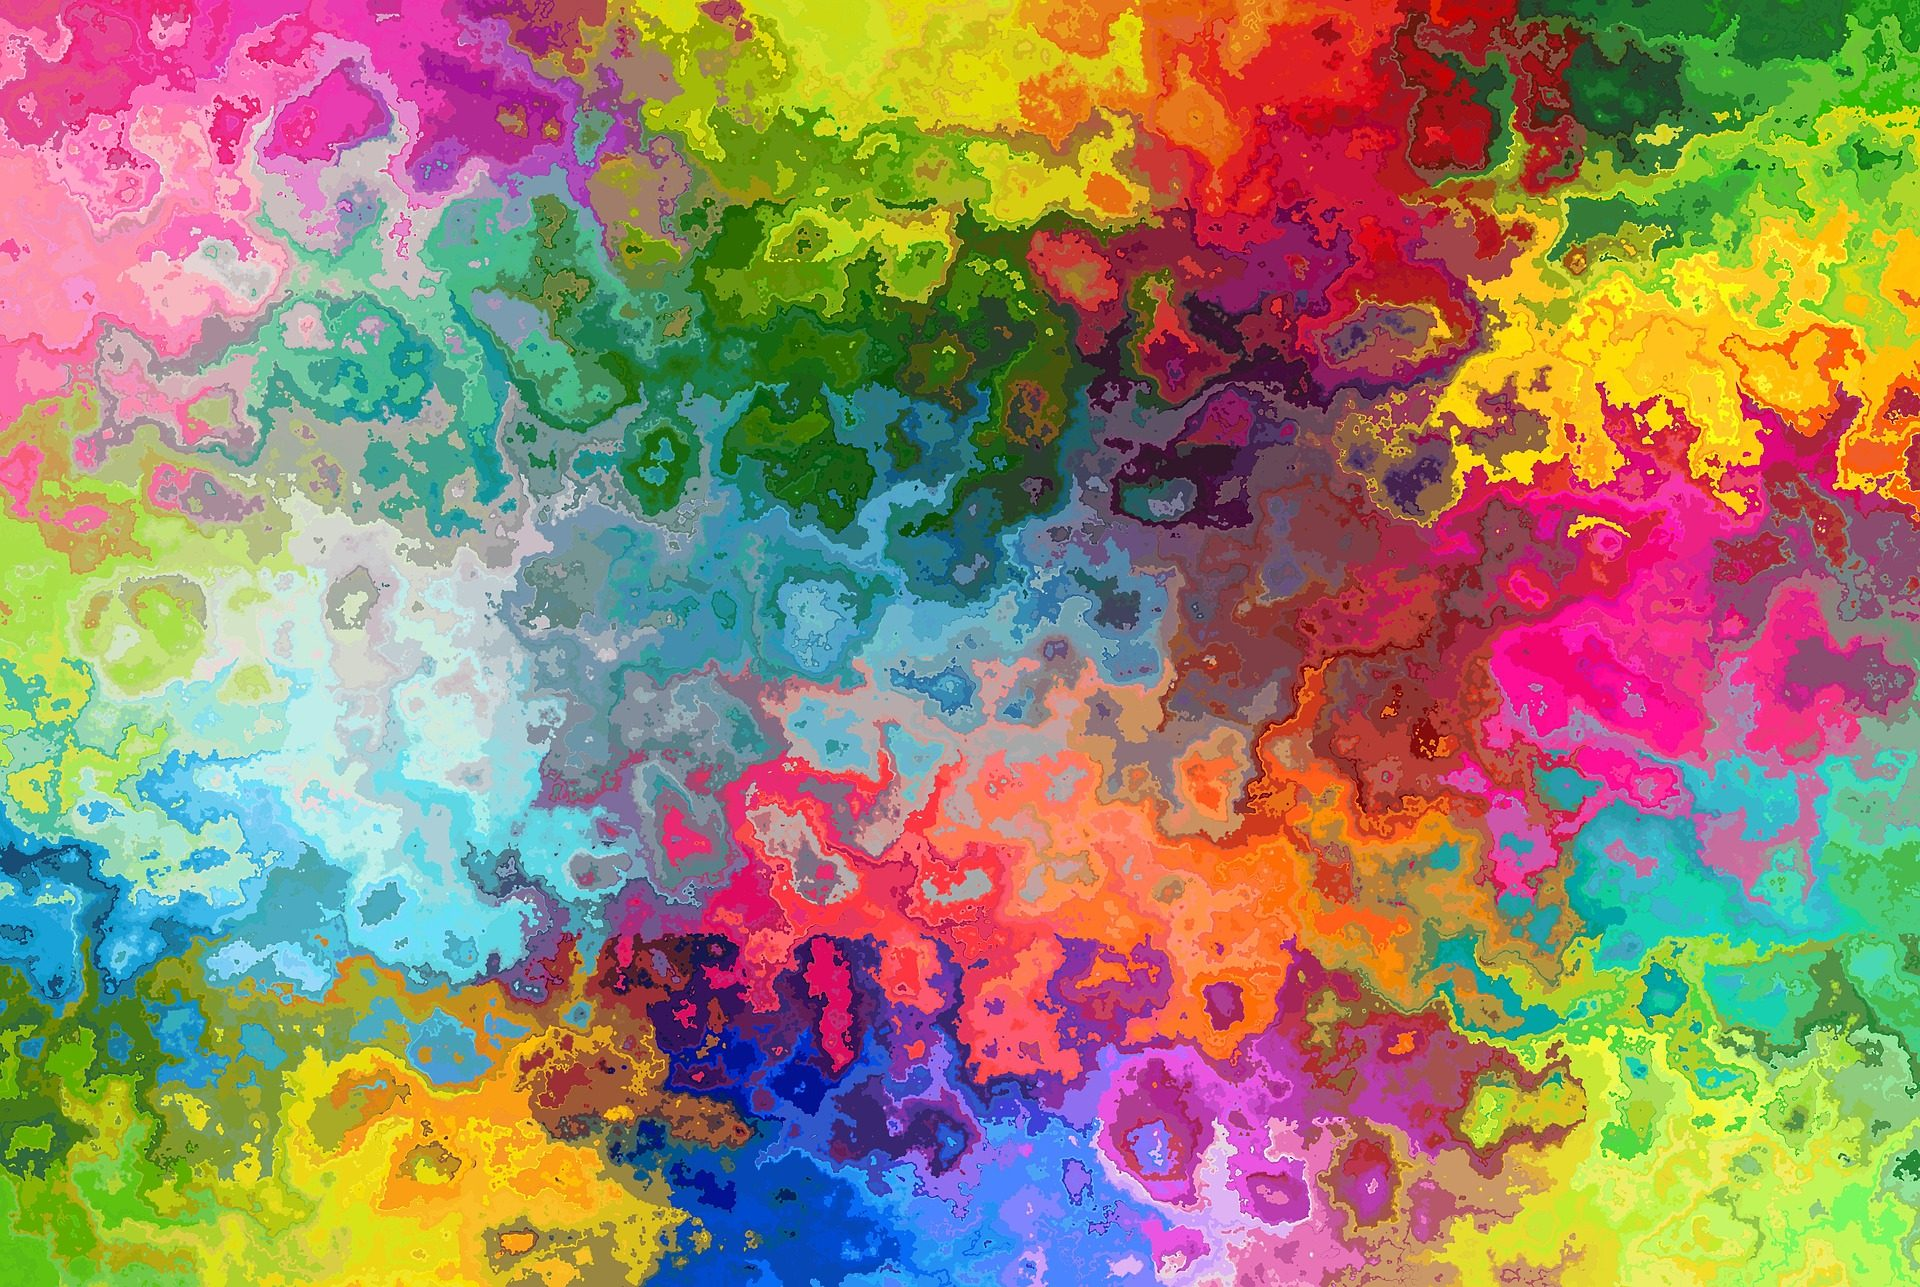 Farben, Formen, Zahlen, Muster, Textur - Wallpaper HD - Prof.-falken.com